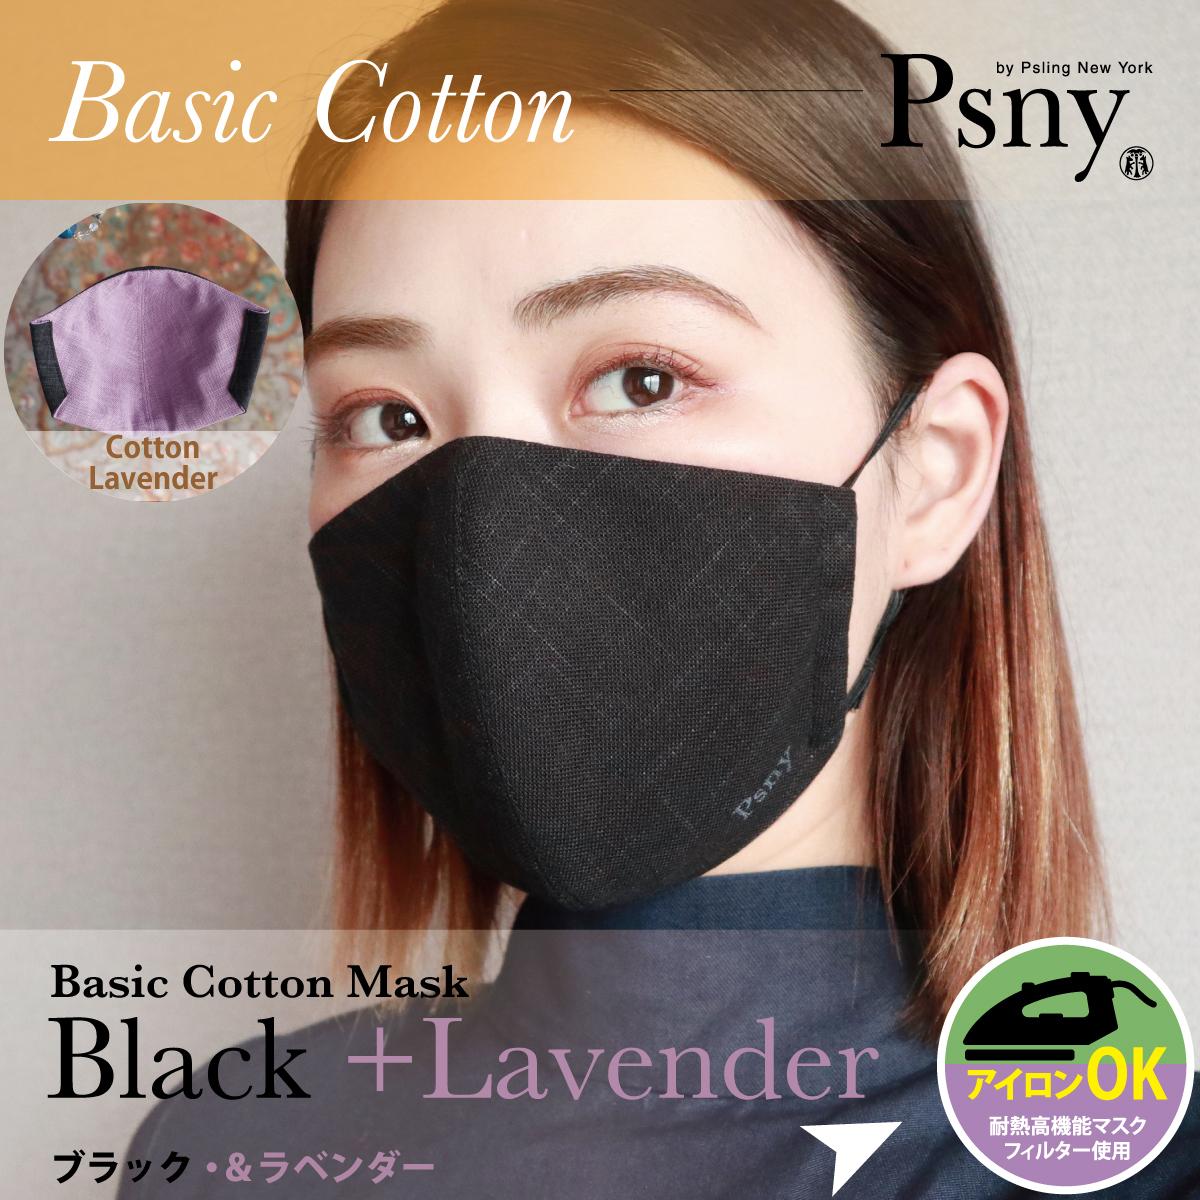 PSNY ベーシックコットン・ブラック(&ラベンダー) 花粉 黄砂 洗えるフィルター入り 立体 マスク 大人用 CB4